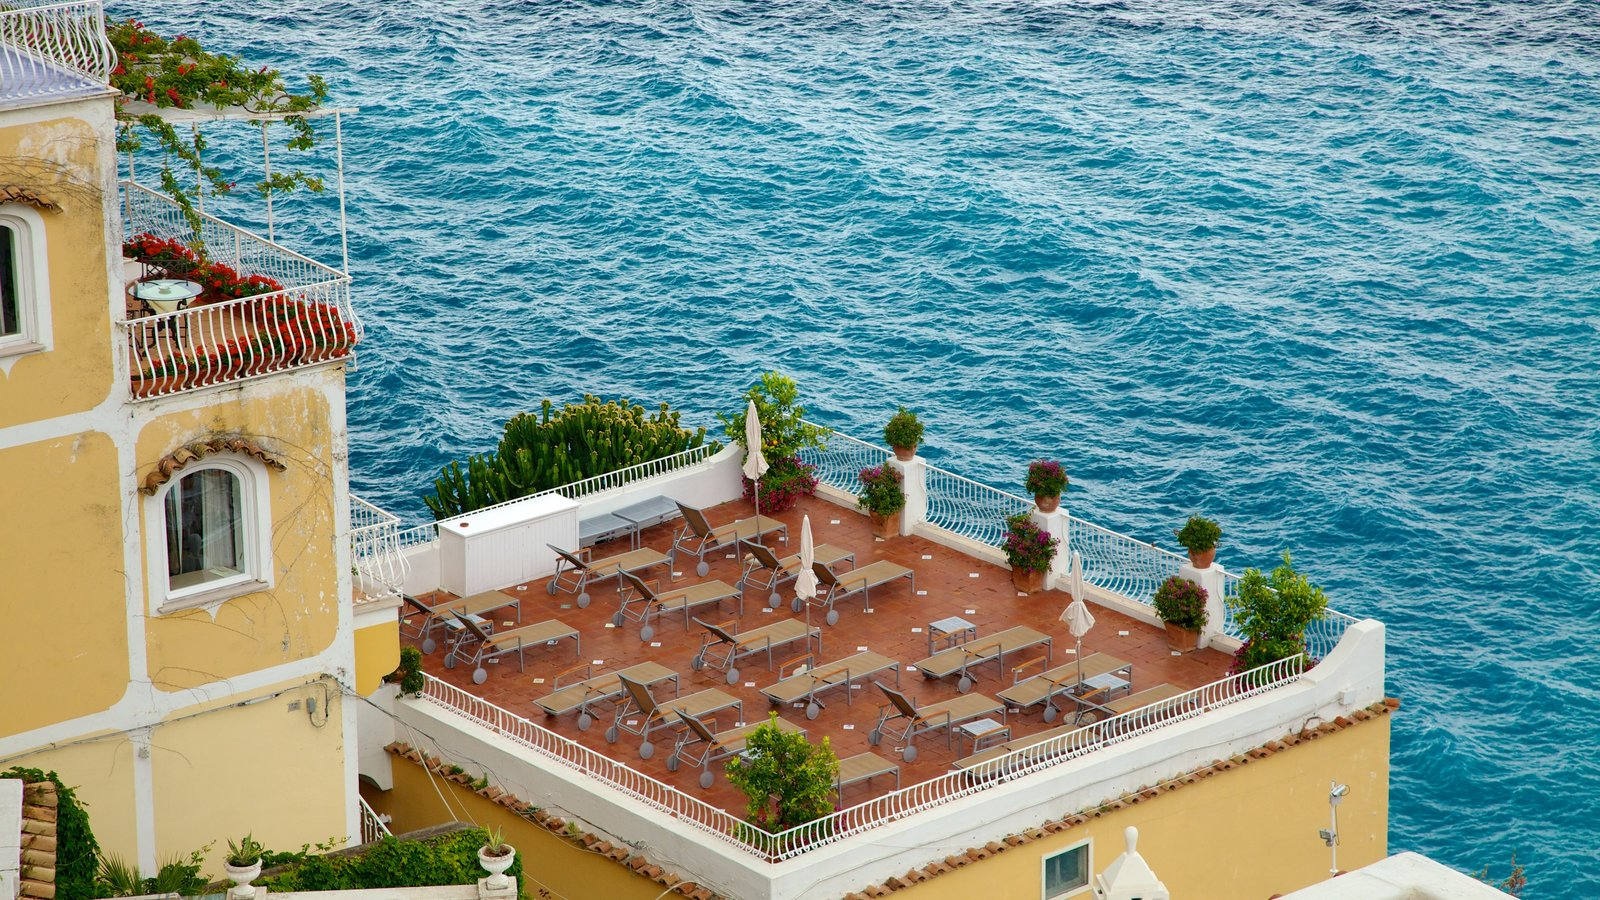 Positano featuring a coastal town, general coastal views and a hotel